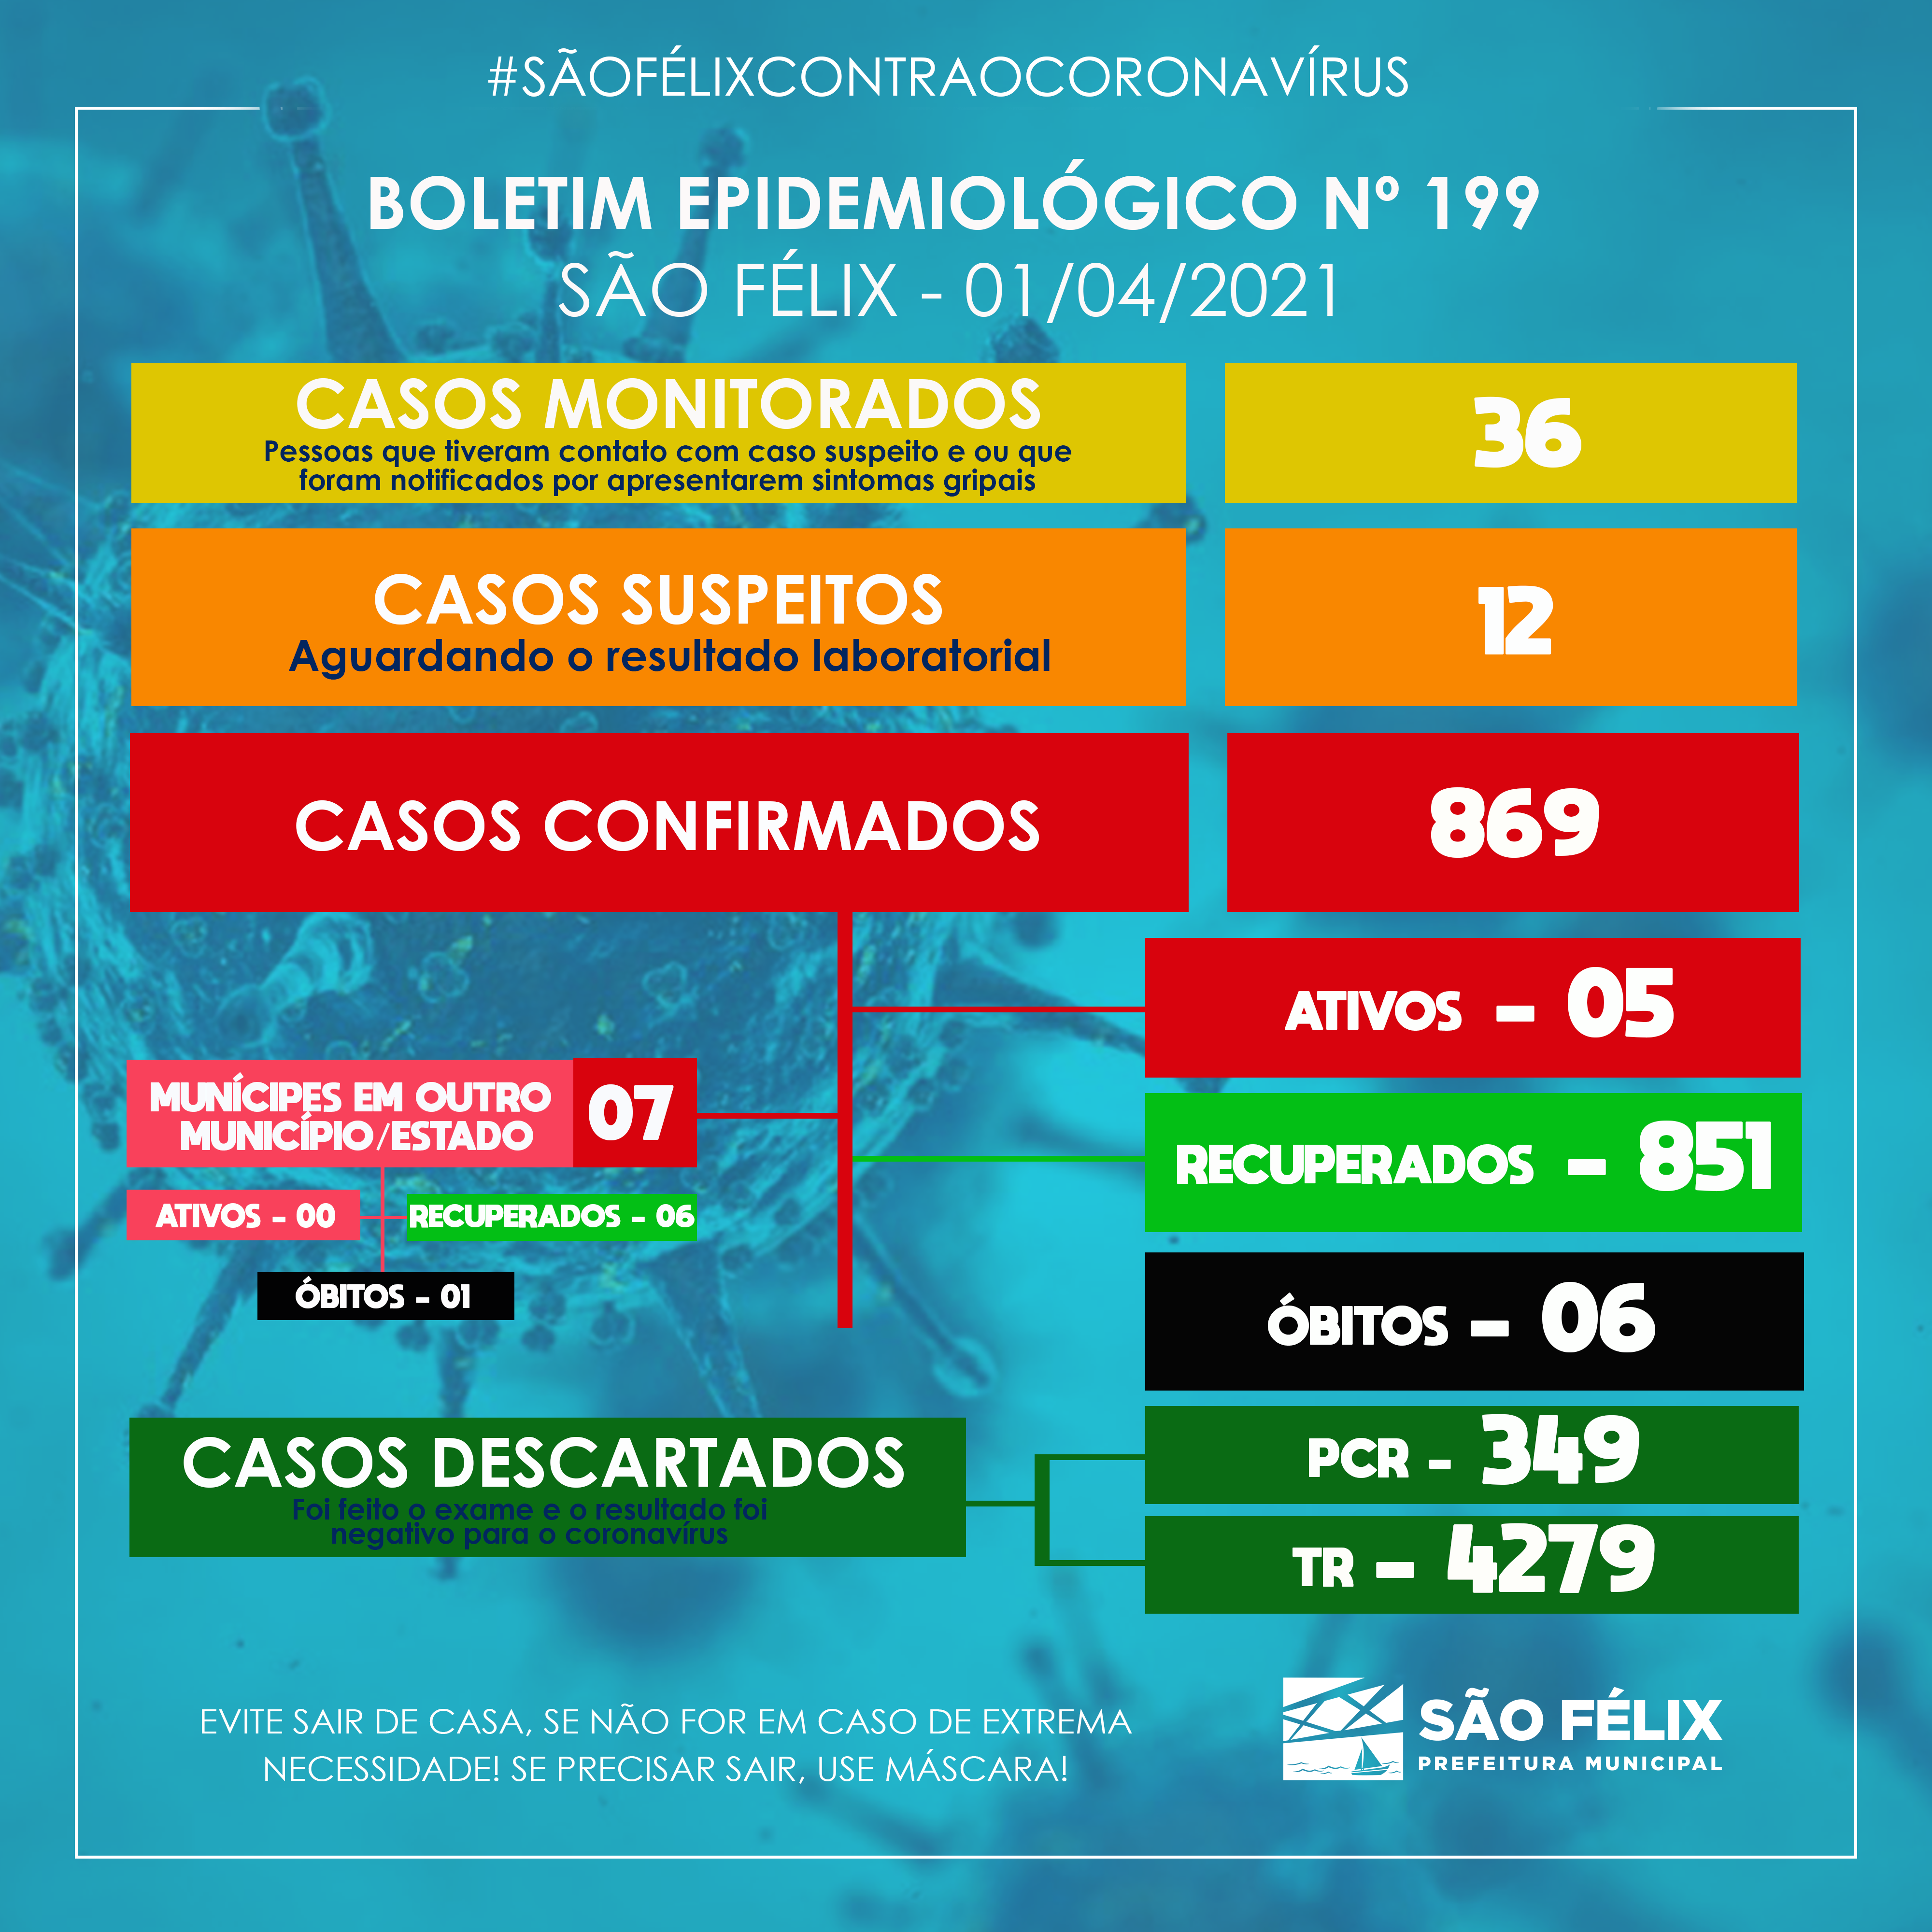 BOLETIM EPIDEMIOLÓGICO Nº 199